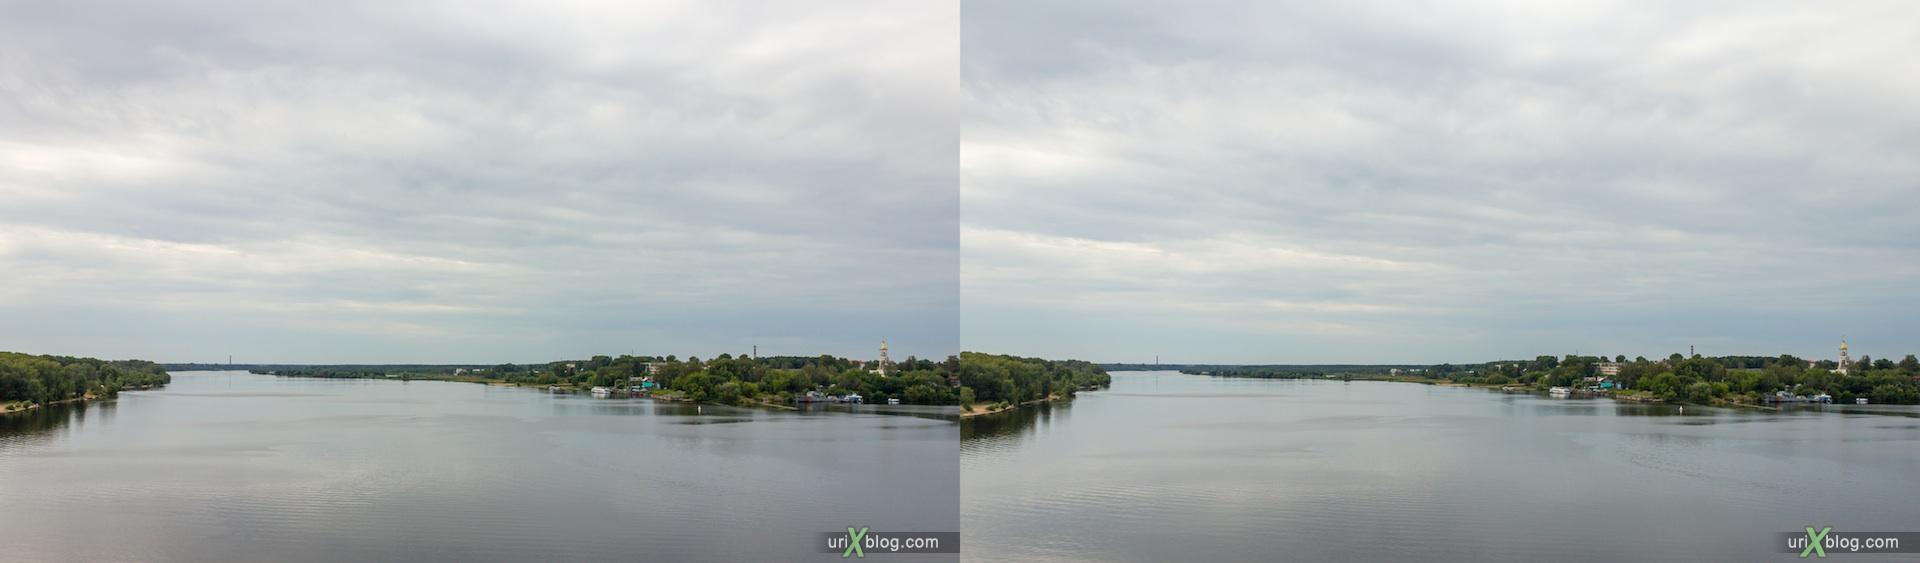 2012 3D stereo stereo pair 3Д стерео Волга река Кимры Савёлово мост